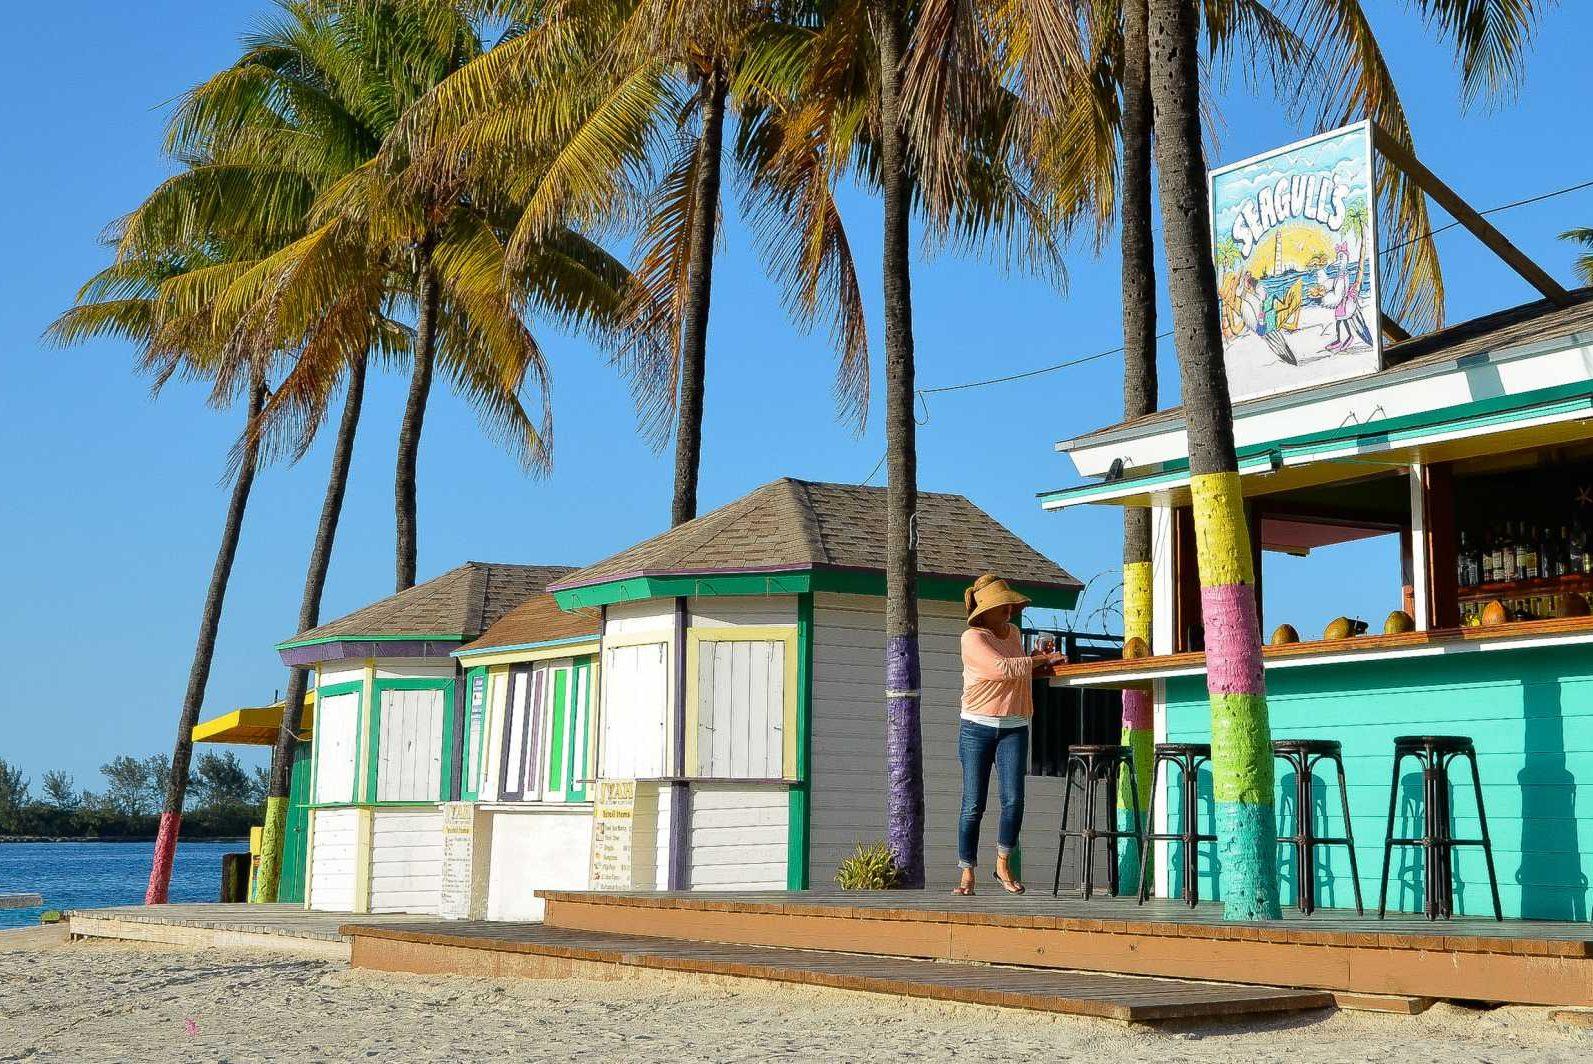 Bahamas - Ouverture